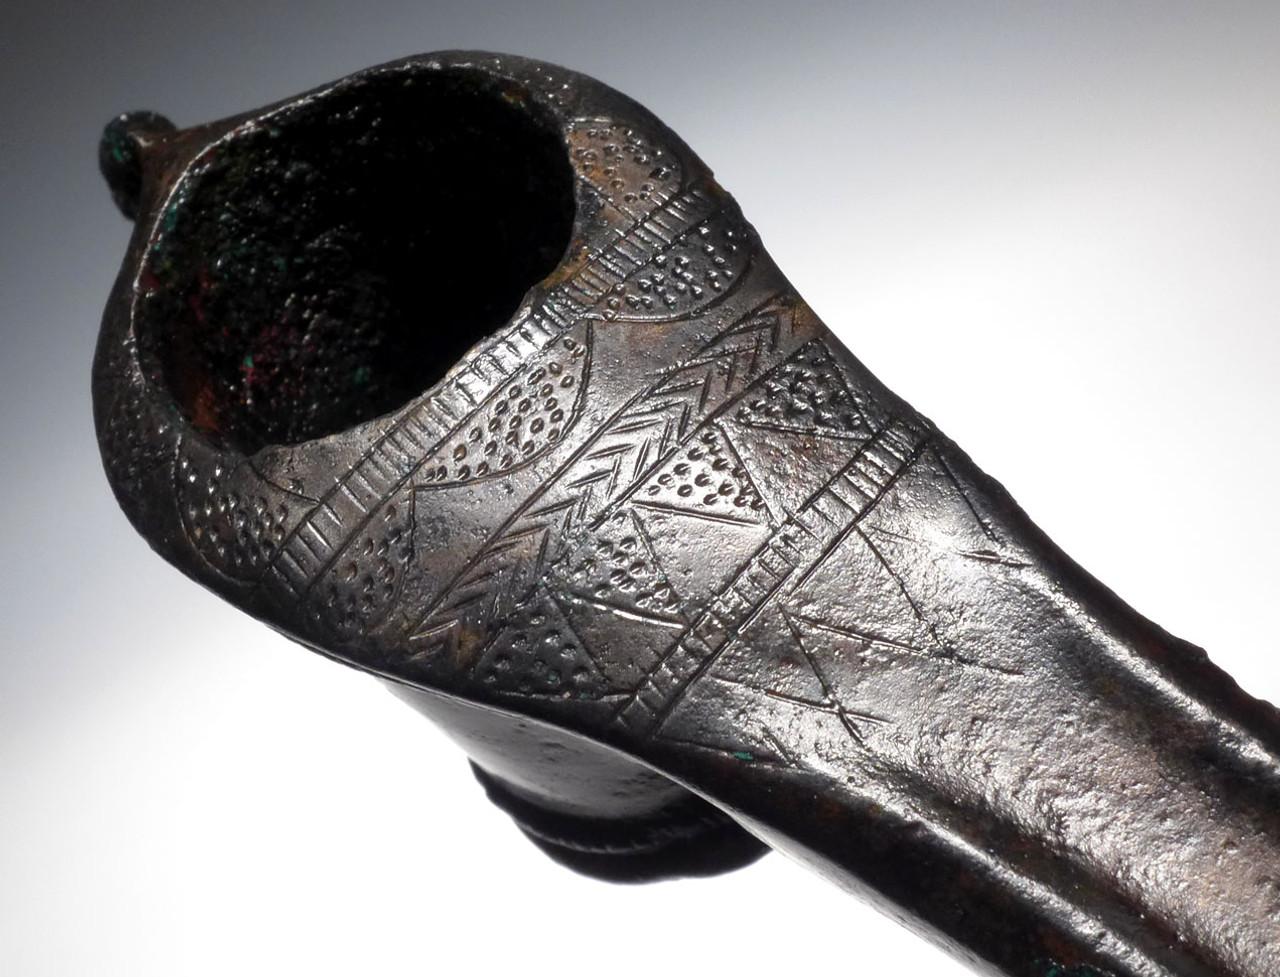 RARE ANCIENT PRESTIGE WEAPON LURISTAN BRONZE DECORATED ADZE AXE *NE201